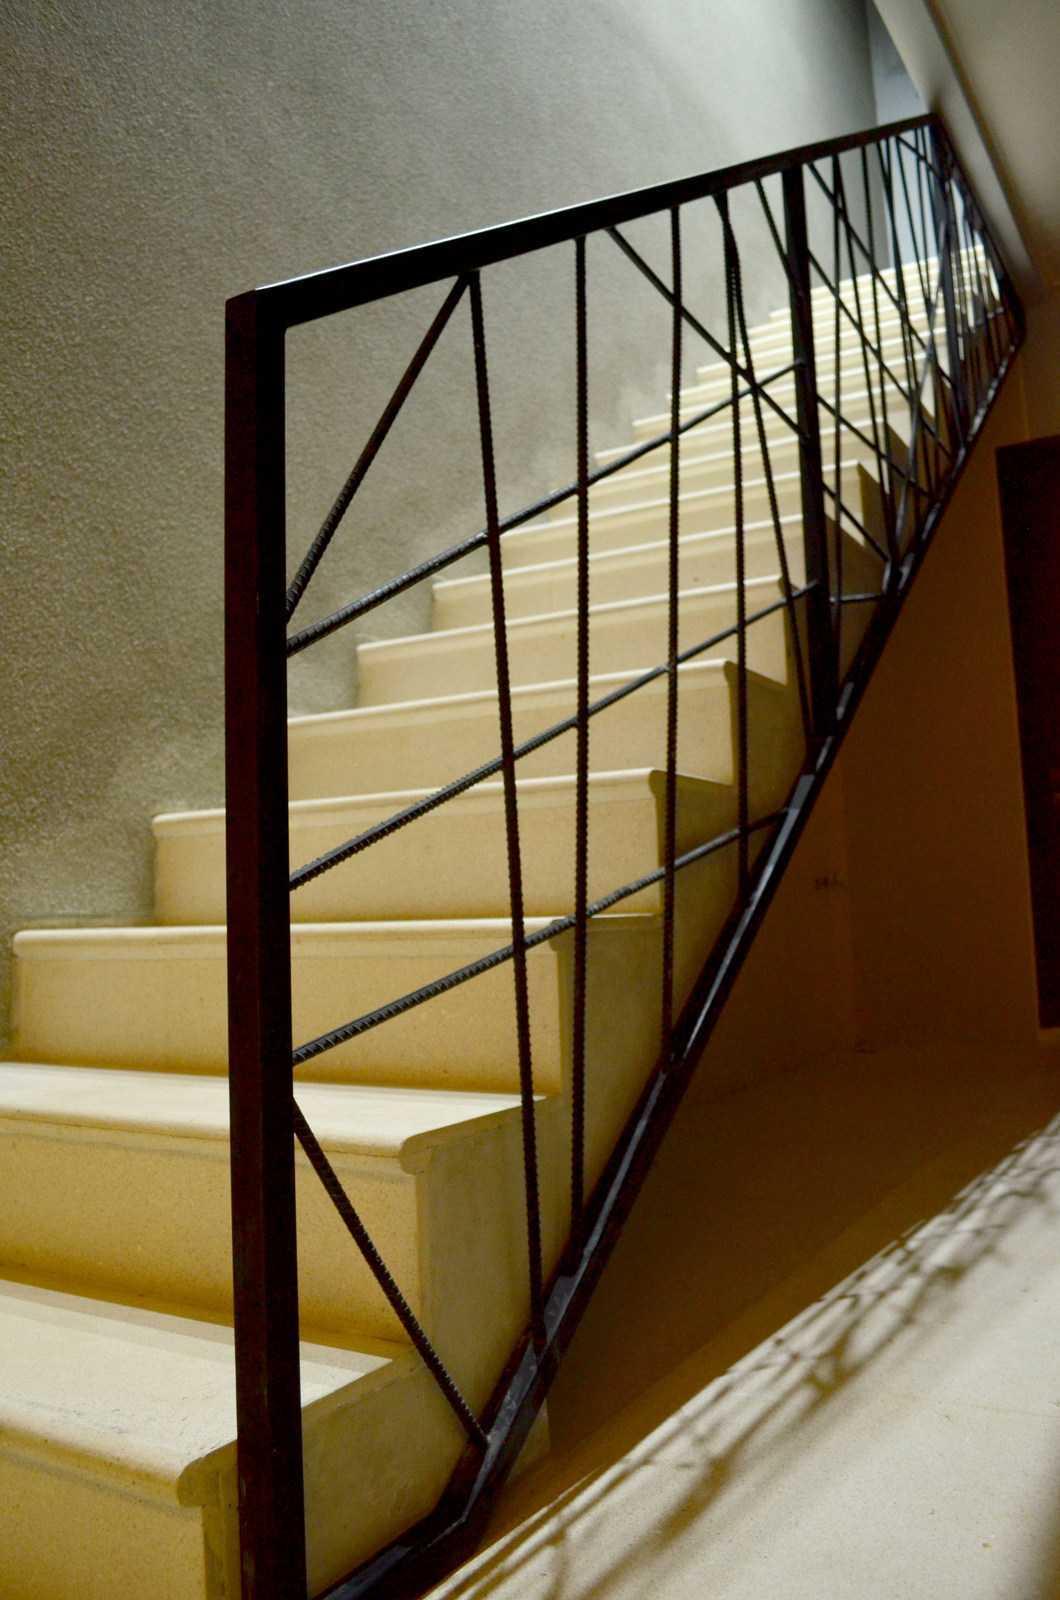 X3M Architects Nittaya A3 15 House Bsd Bsd Stairs   25291